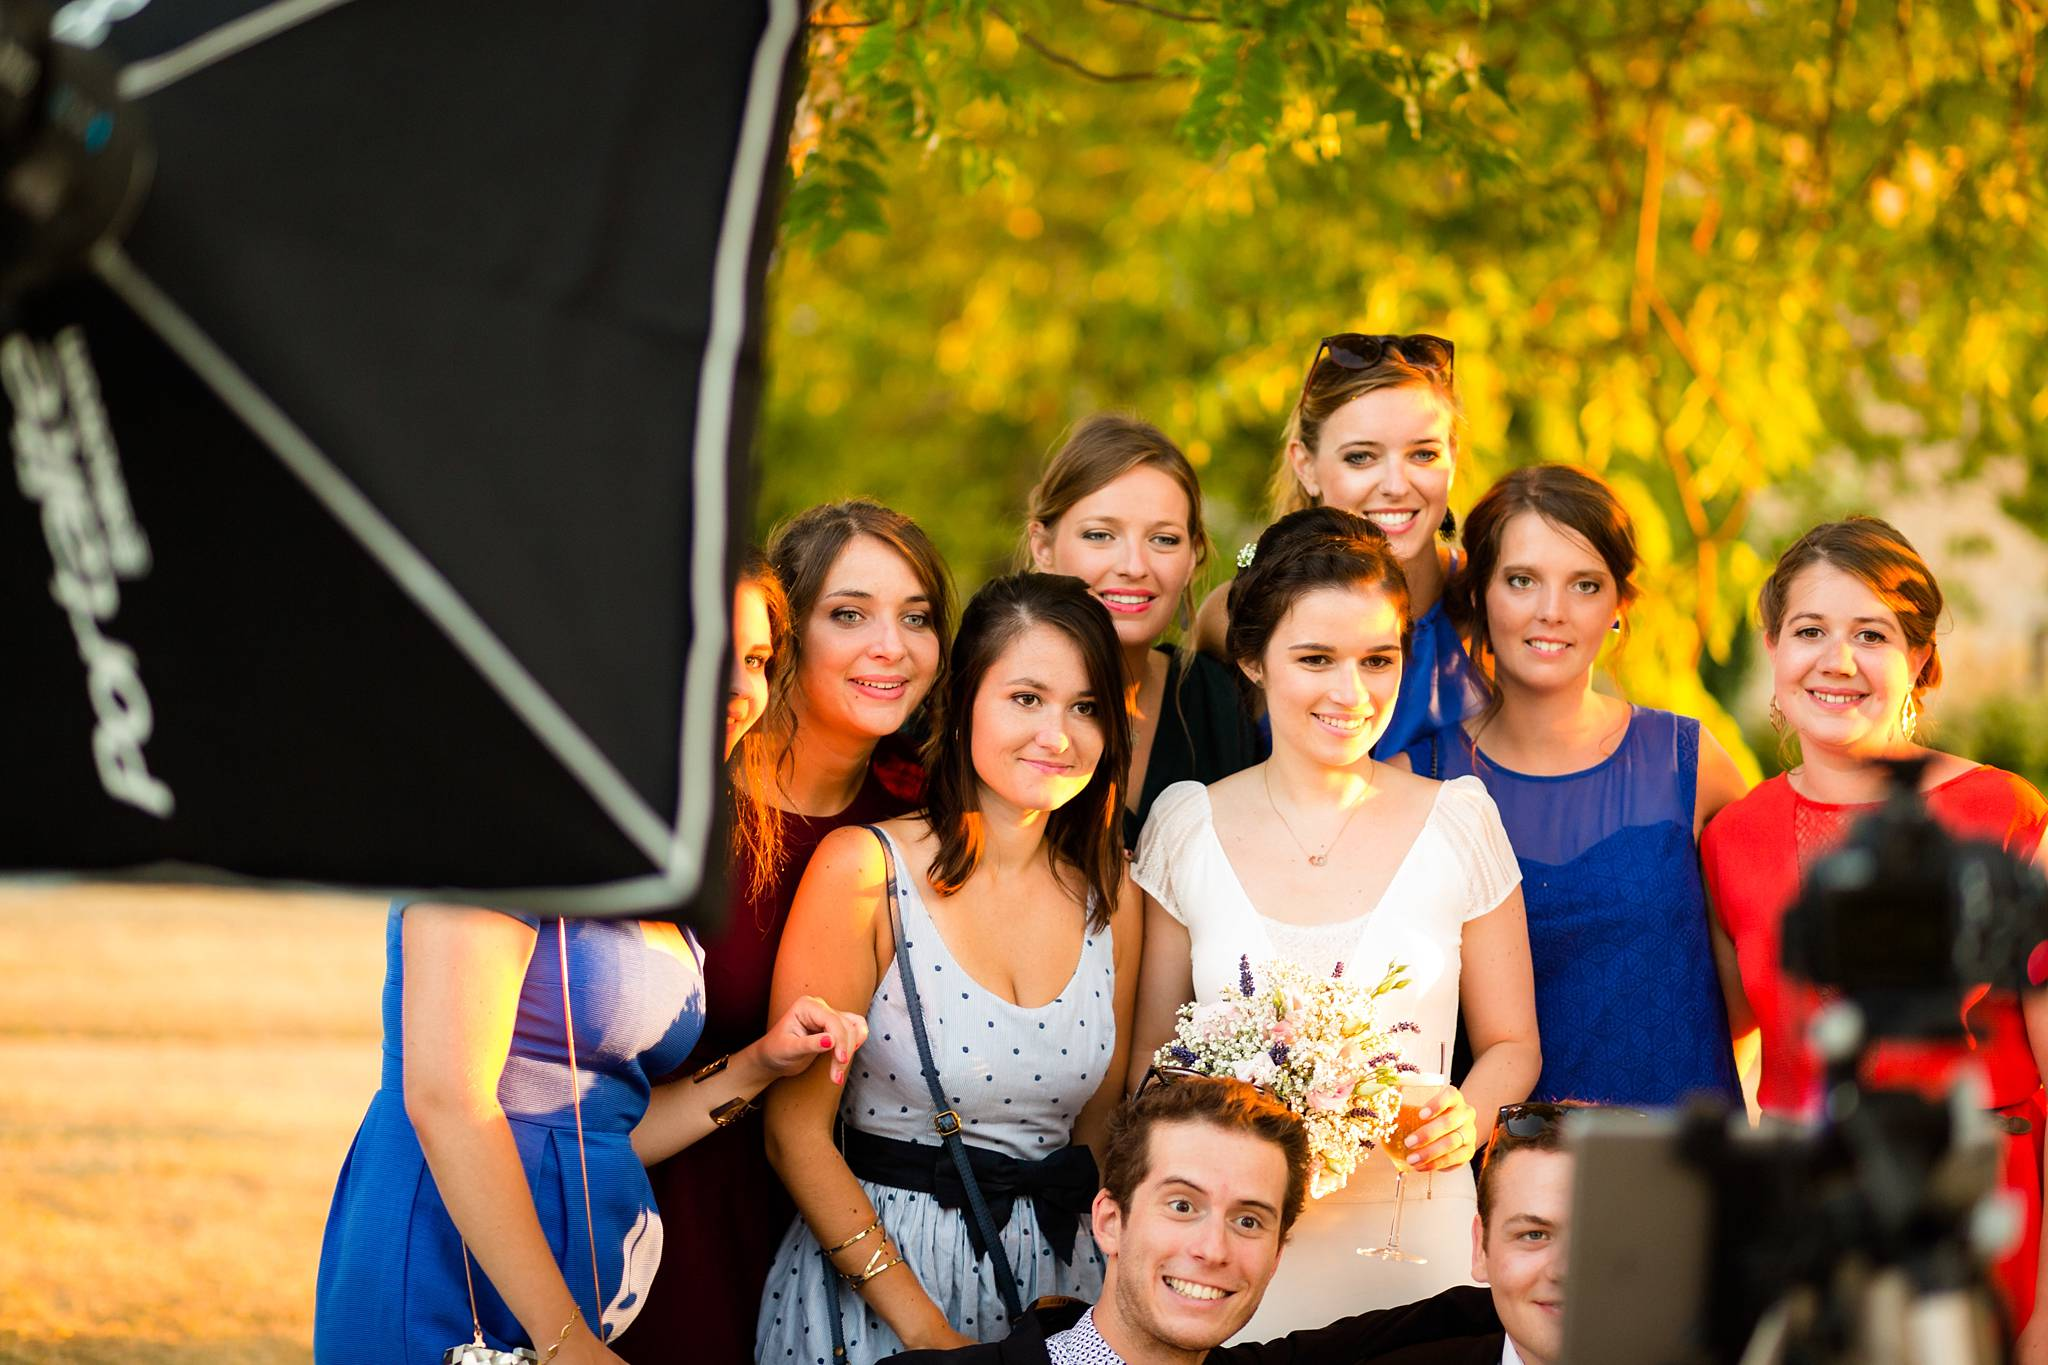 06_photobooth-mariage-backstage-bordeaux-gironde-dordogne-charentes-alexandre-roschewitz-photographies_2048px